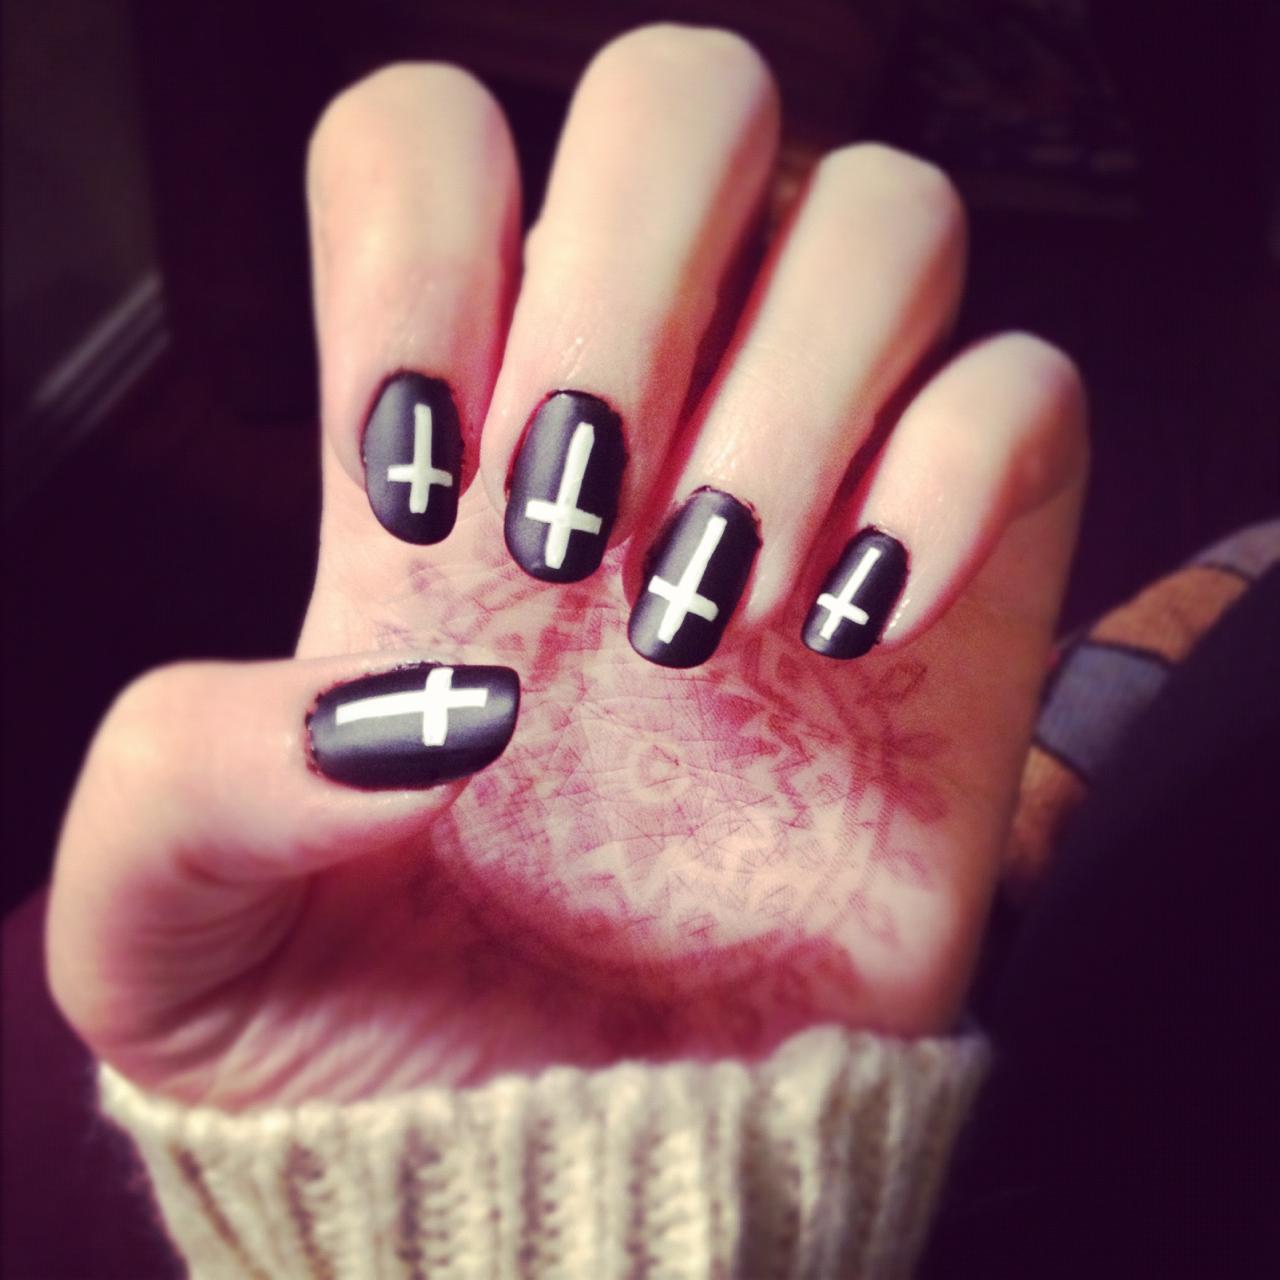 14 Black And White Nail Designs Tumblr Images White Nail Designs